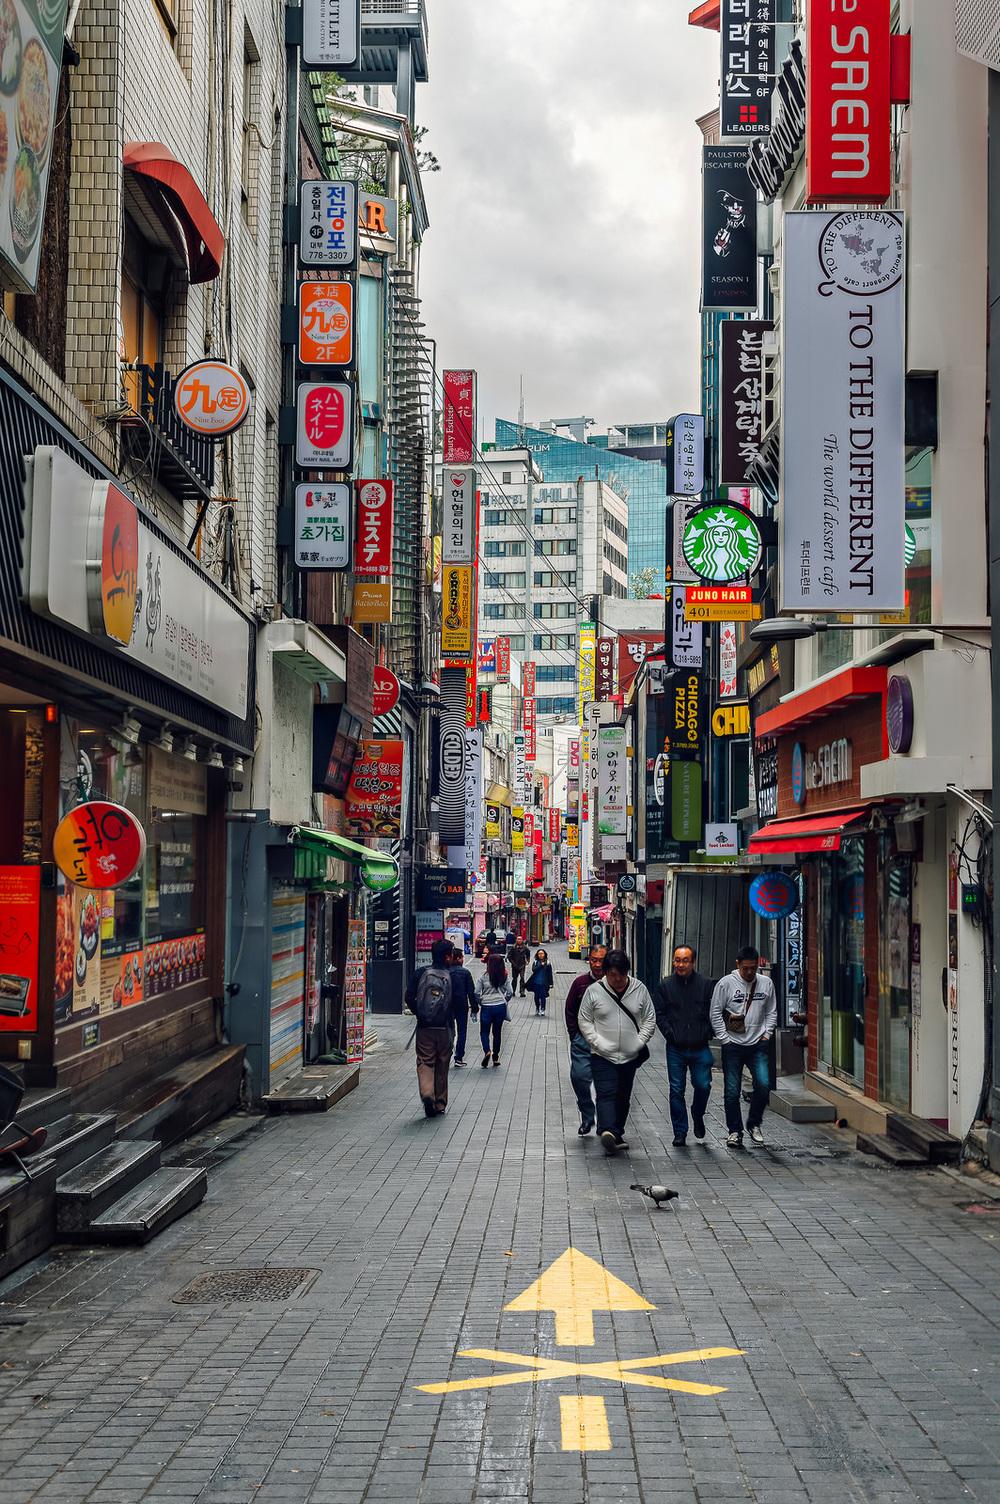 Yeouido Park 여의도공원 Seoul South Korea Travel Photography 2016